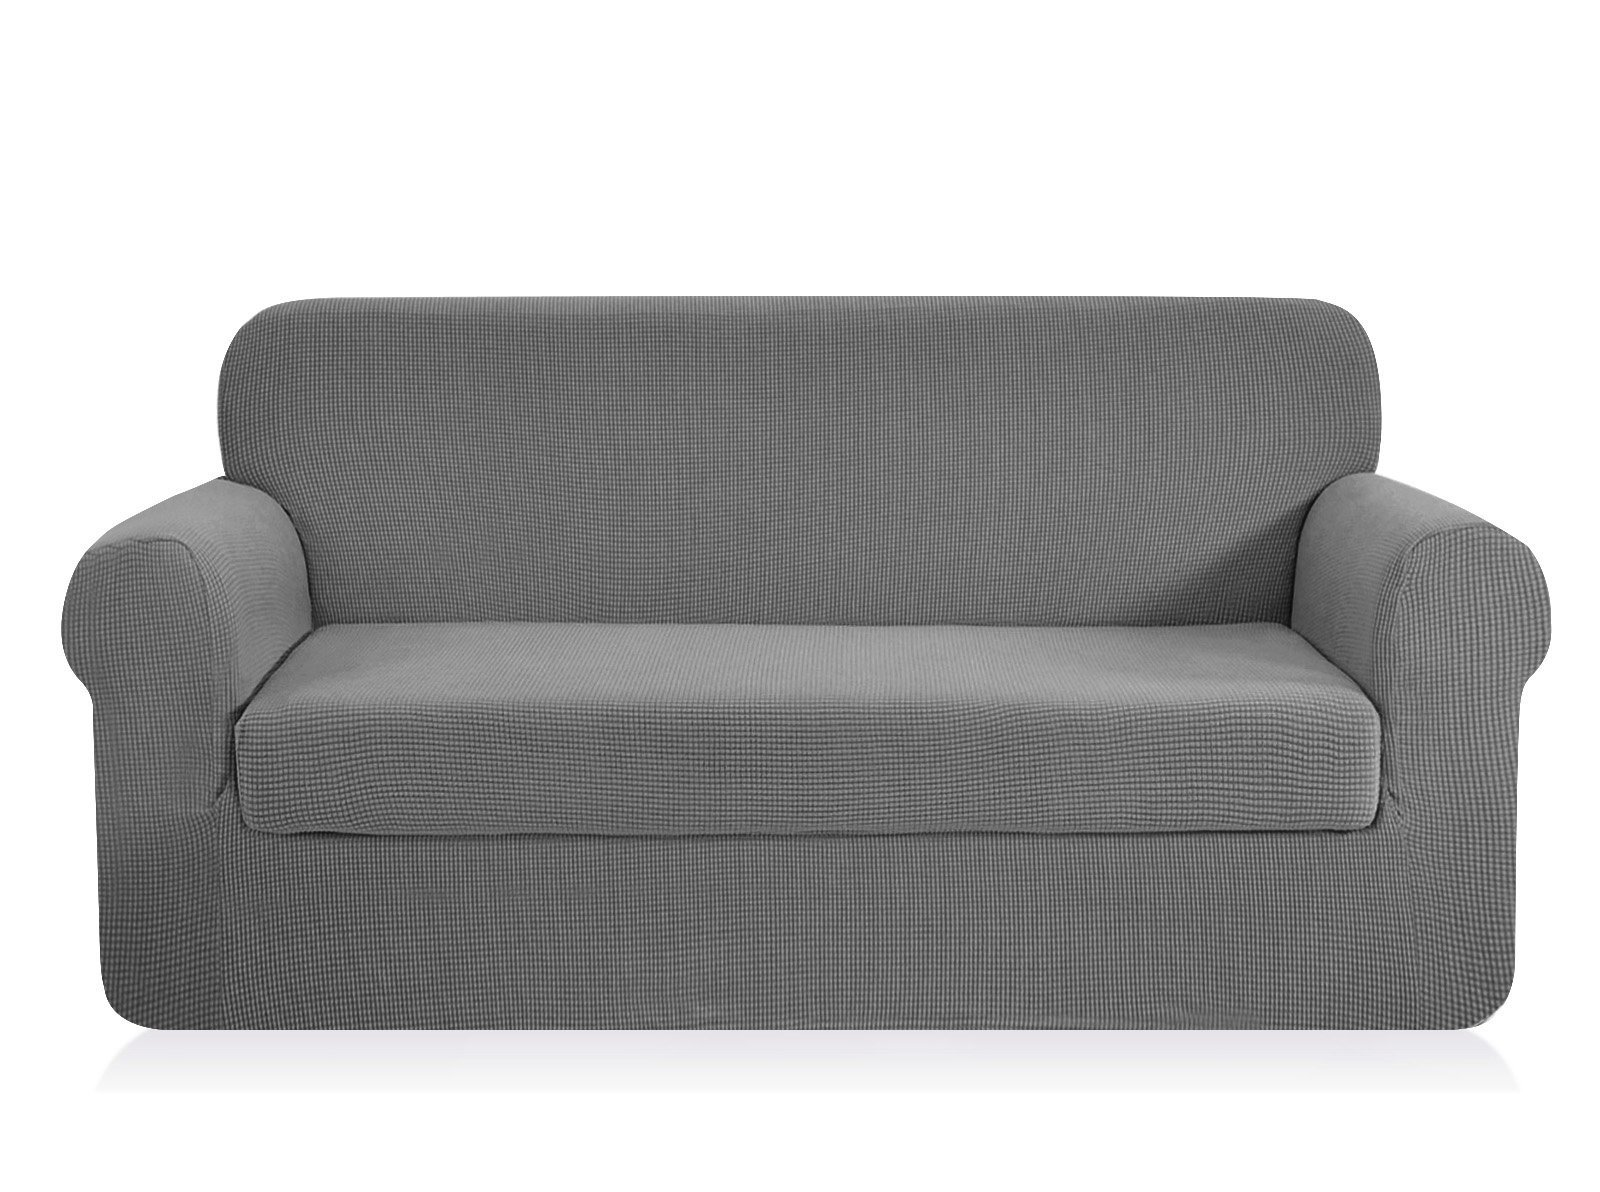 CHUN YI 2-Piece Jacquard Polyester Spandex Slipcover (Sofa, Light Gray)